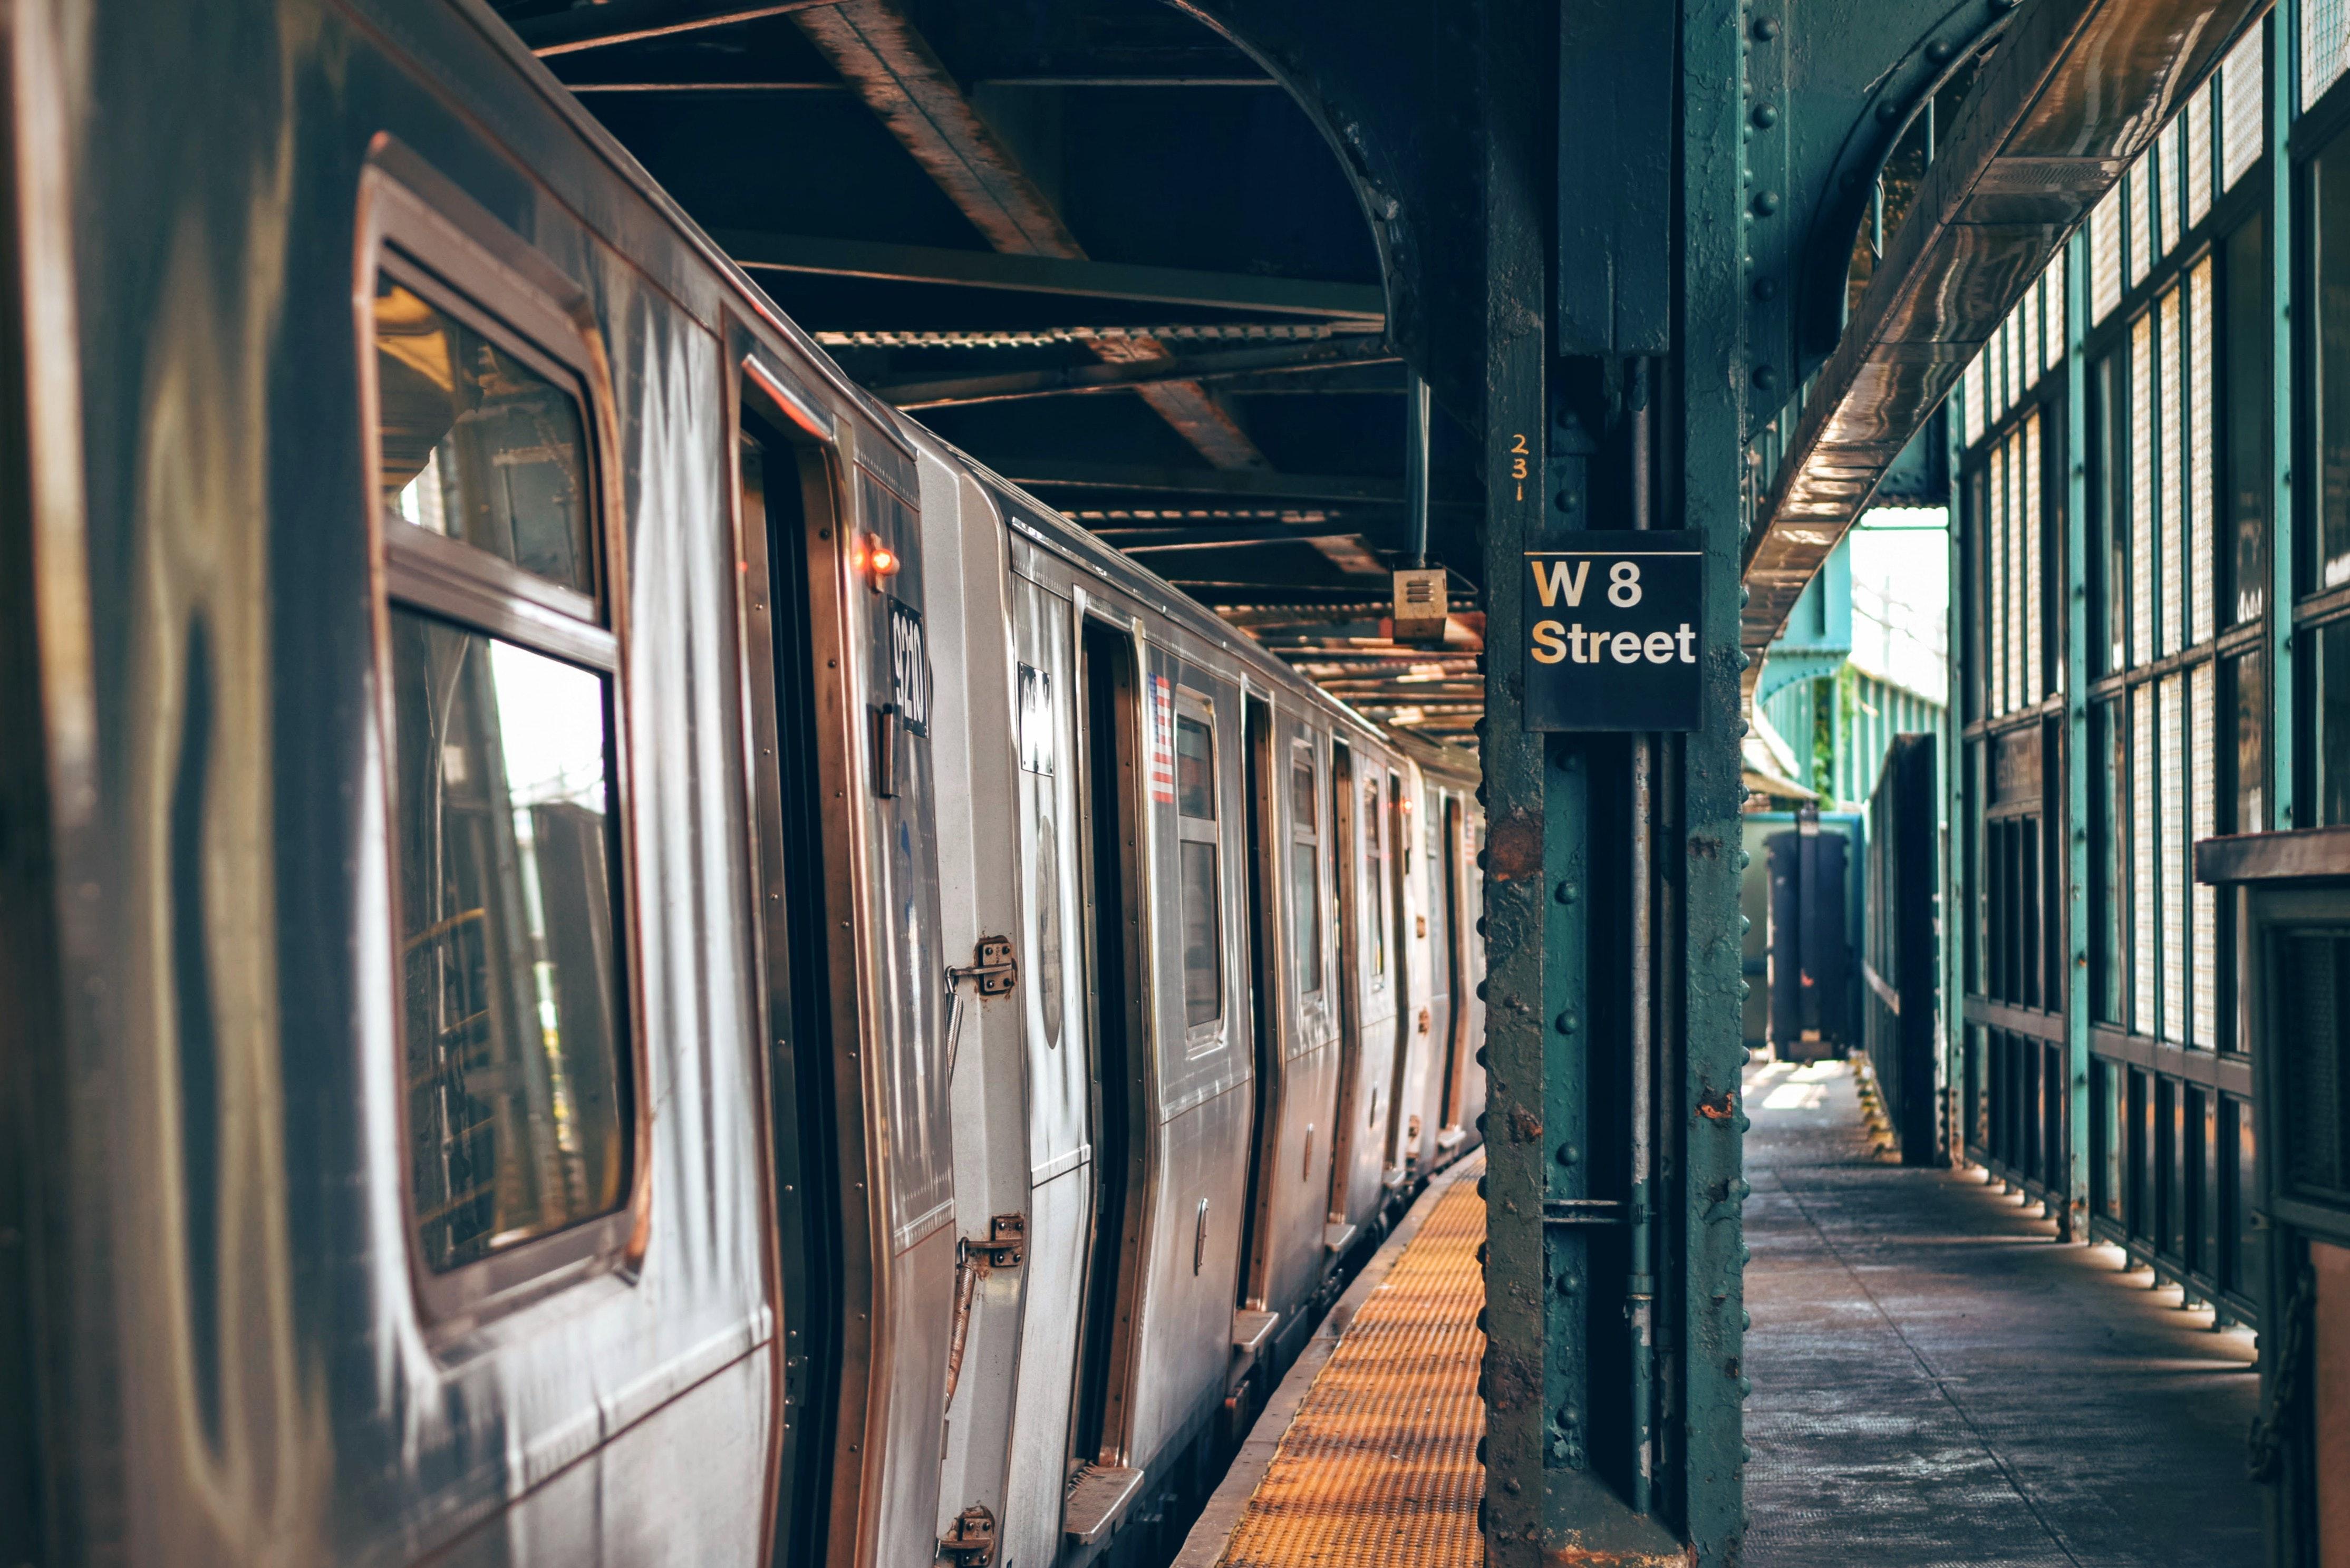 Silver train on w8 street platform photo